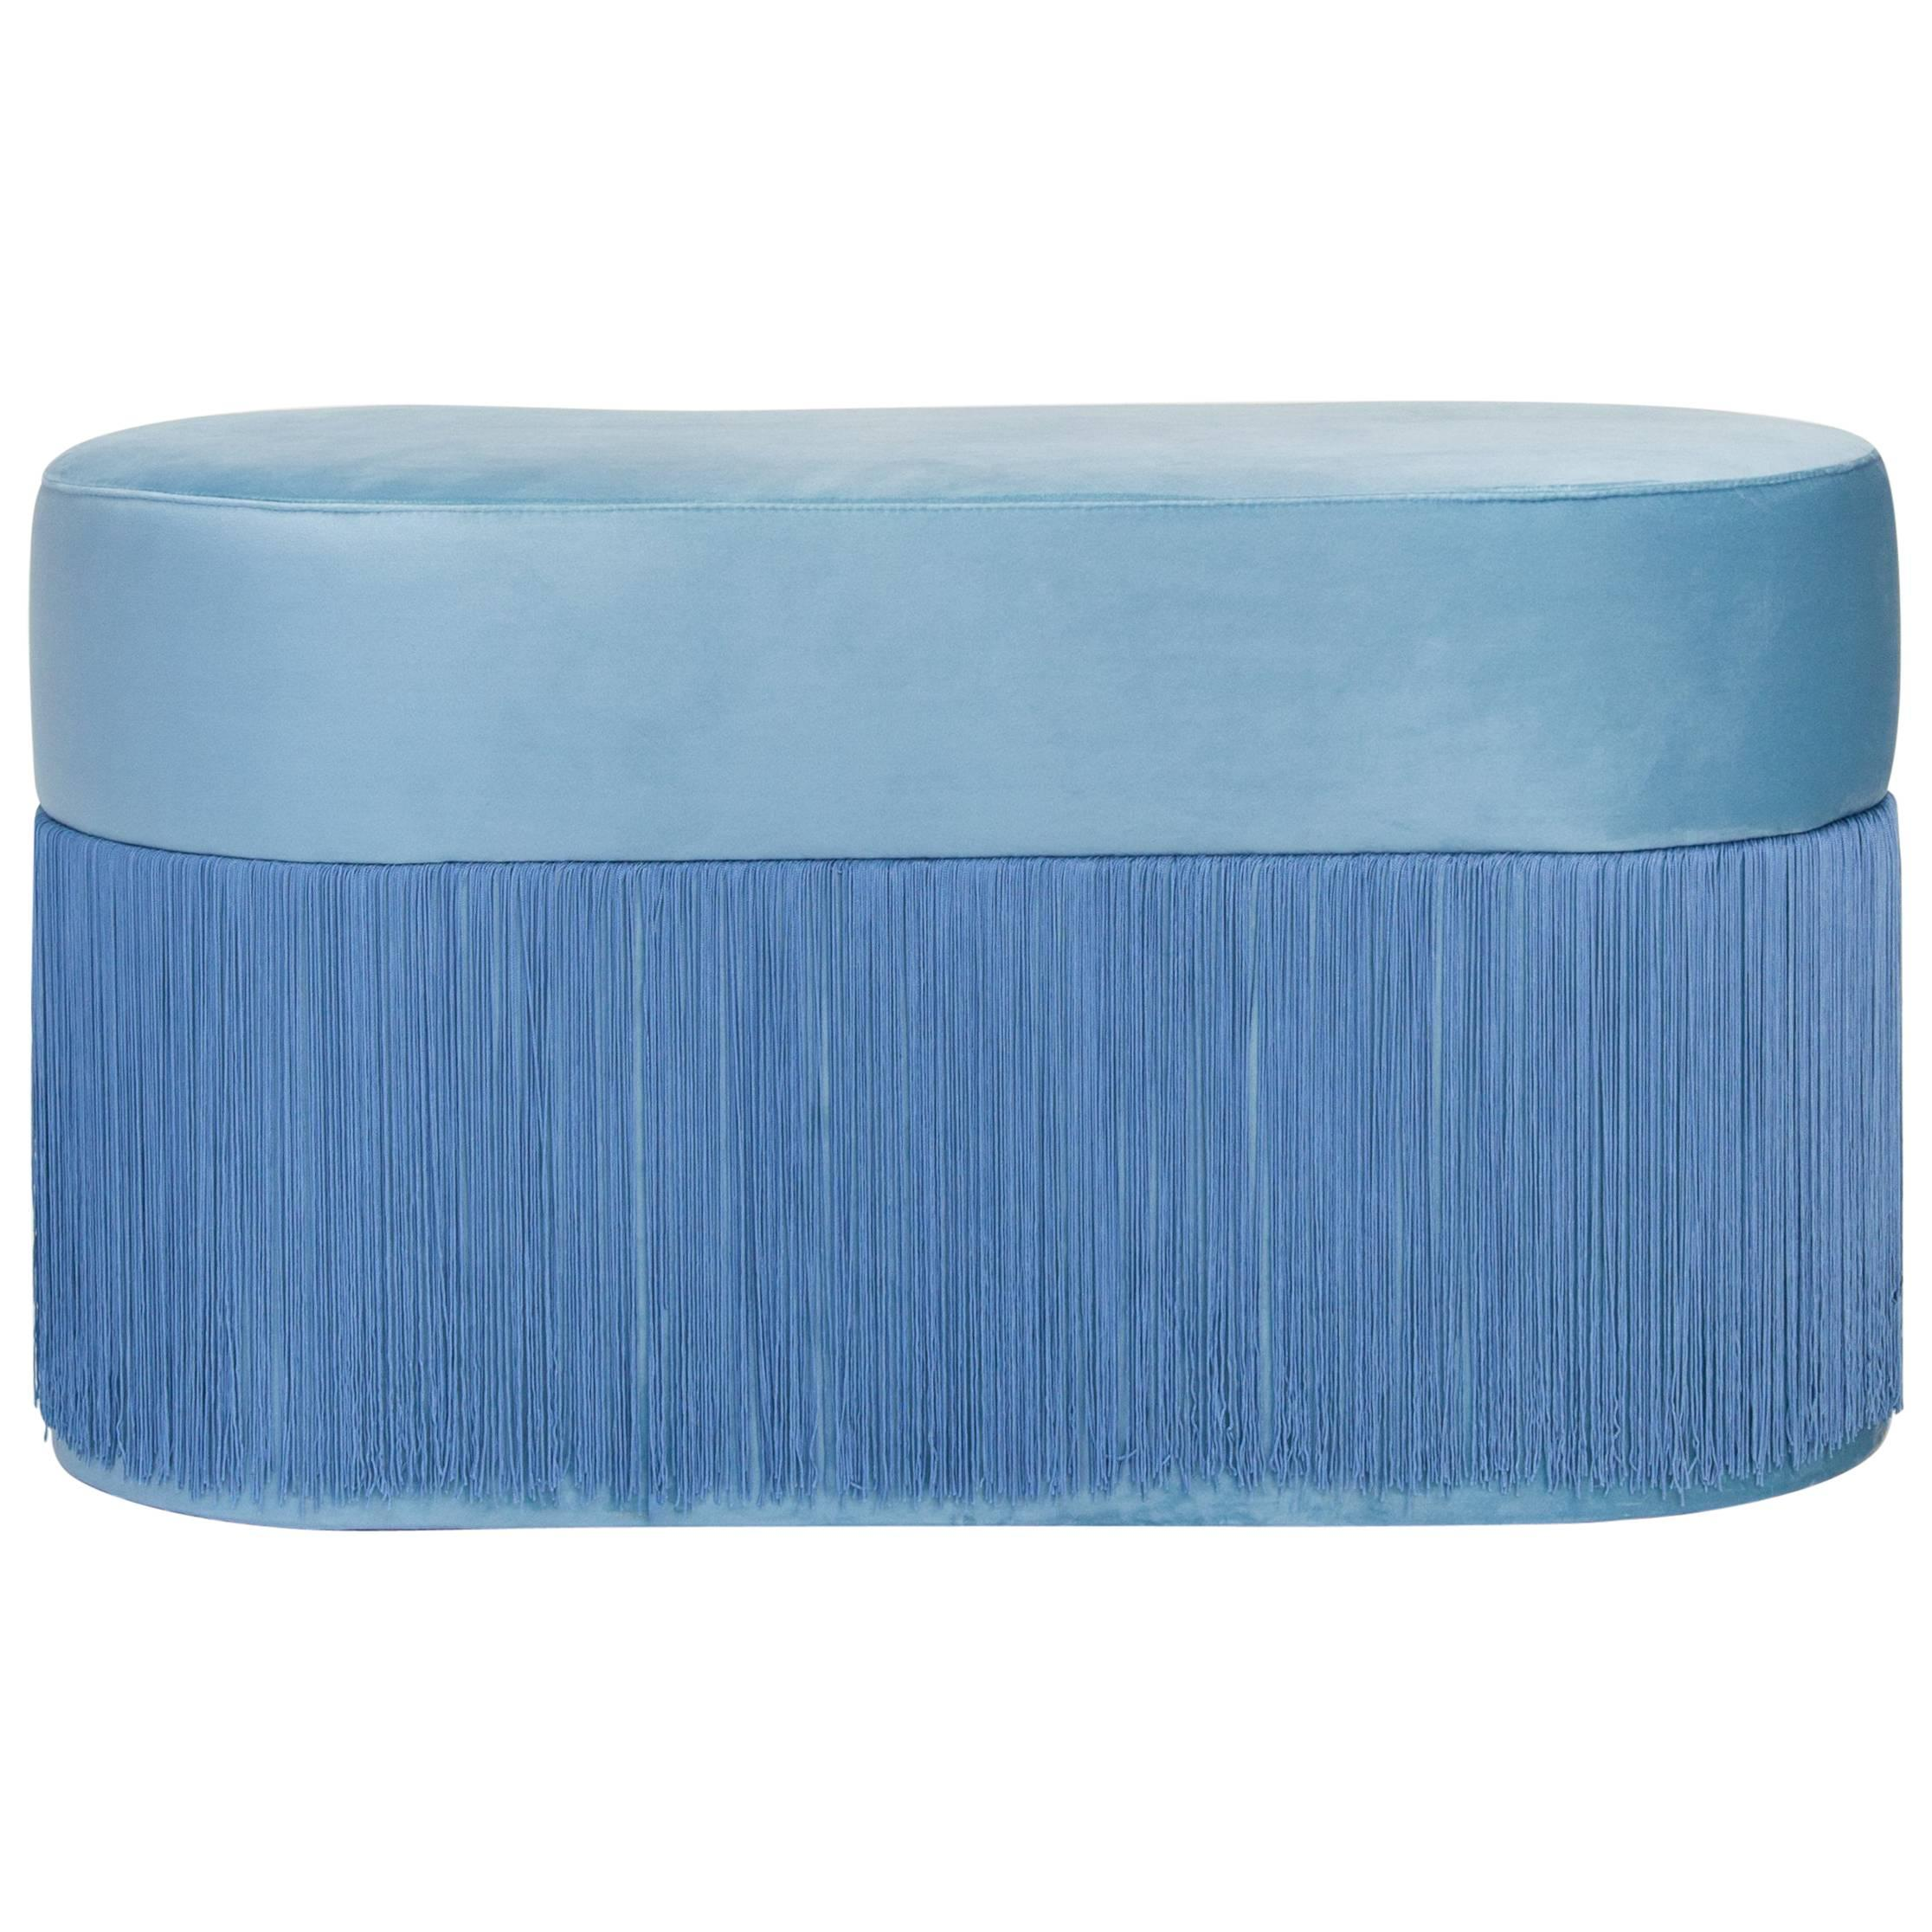 Pouf Pill Large Blue in Velvet Upholstery with Fringes